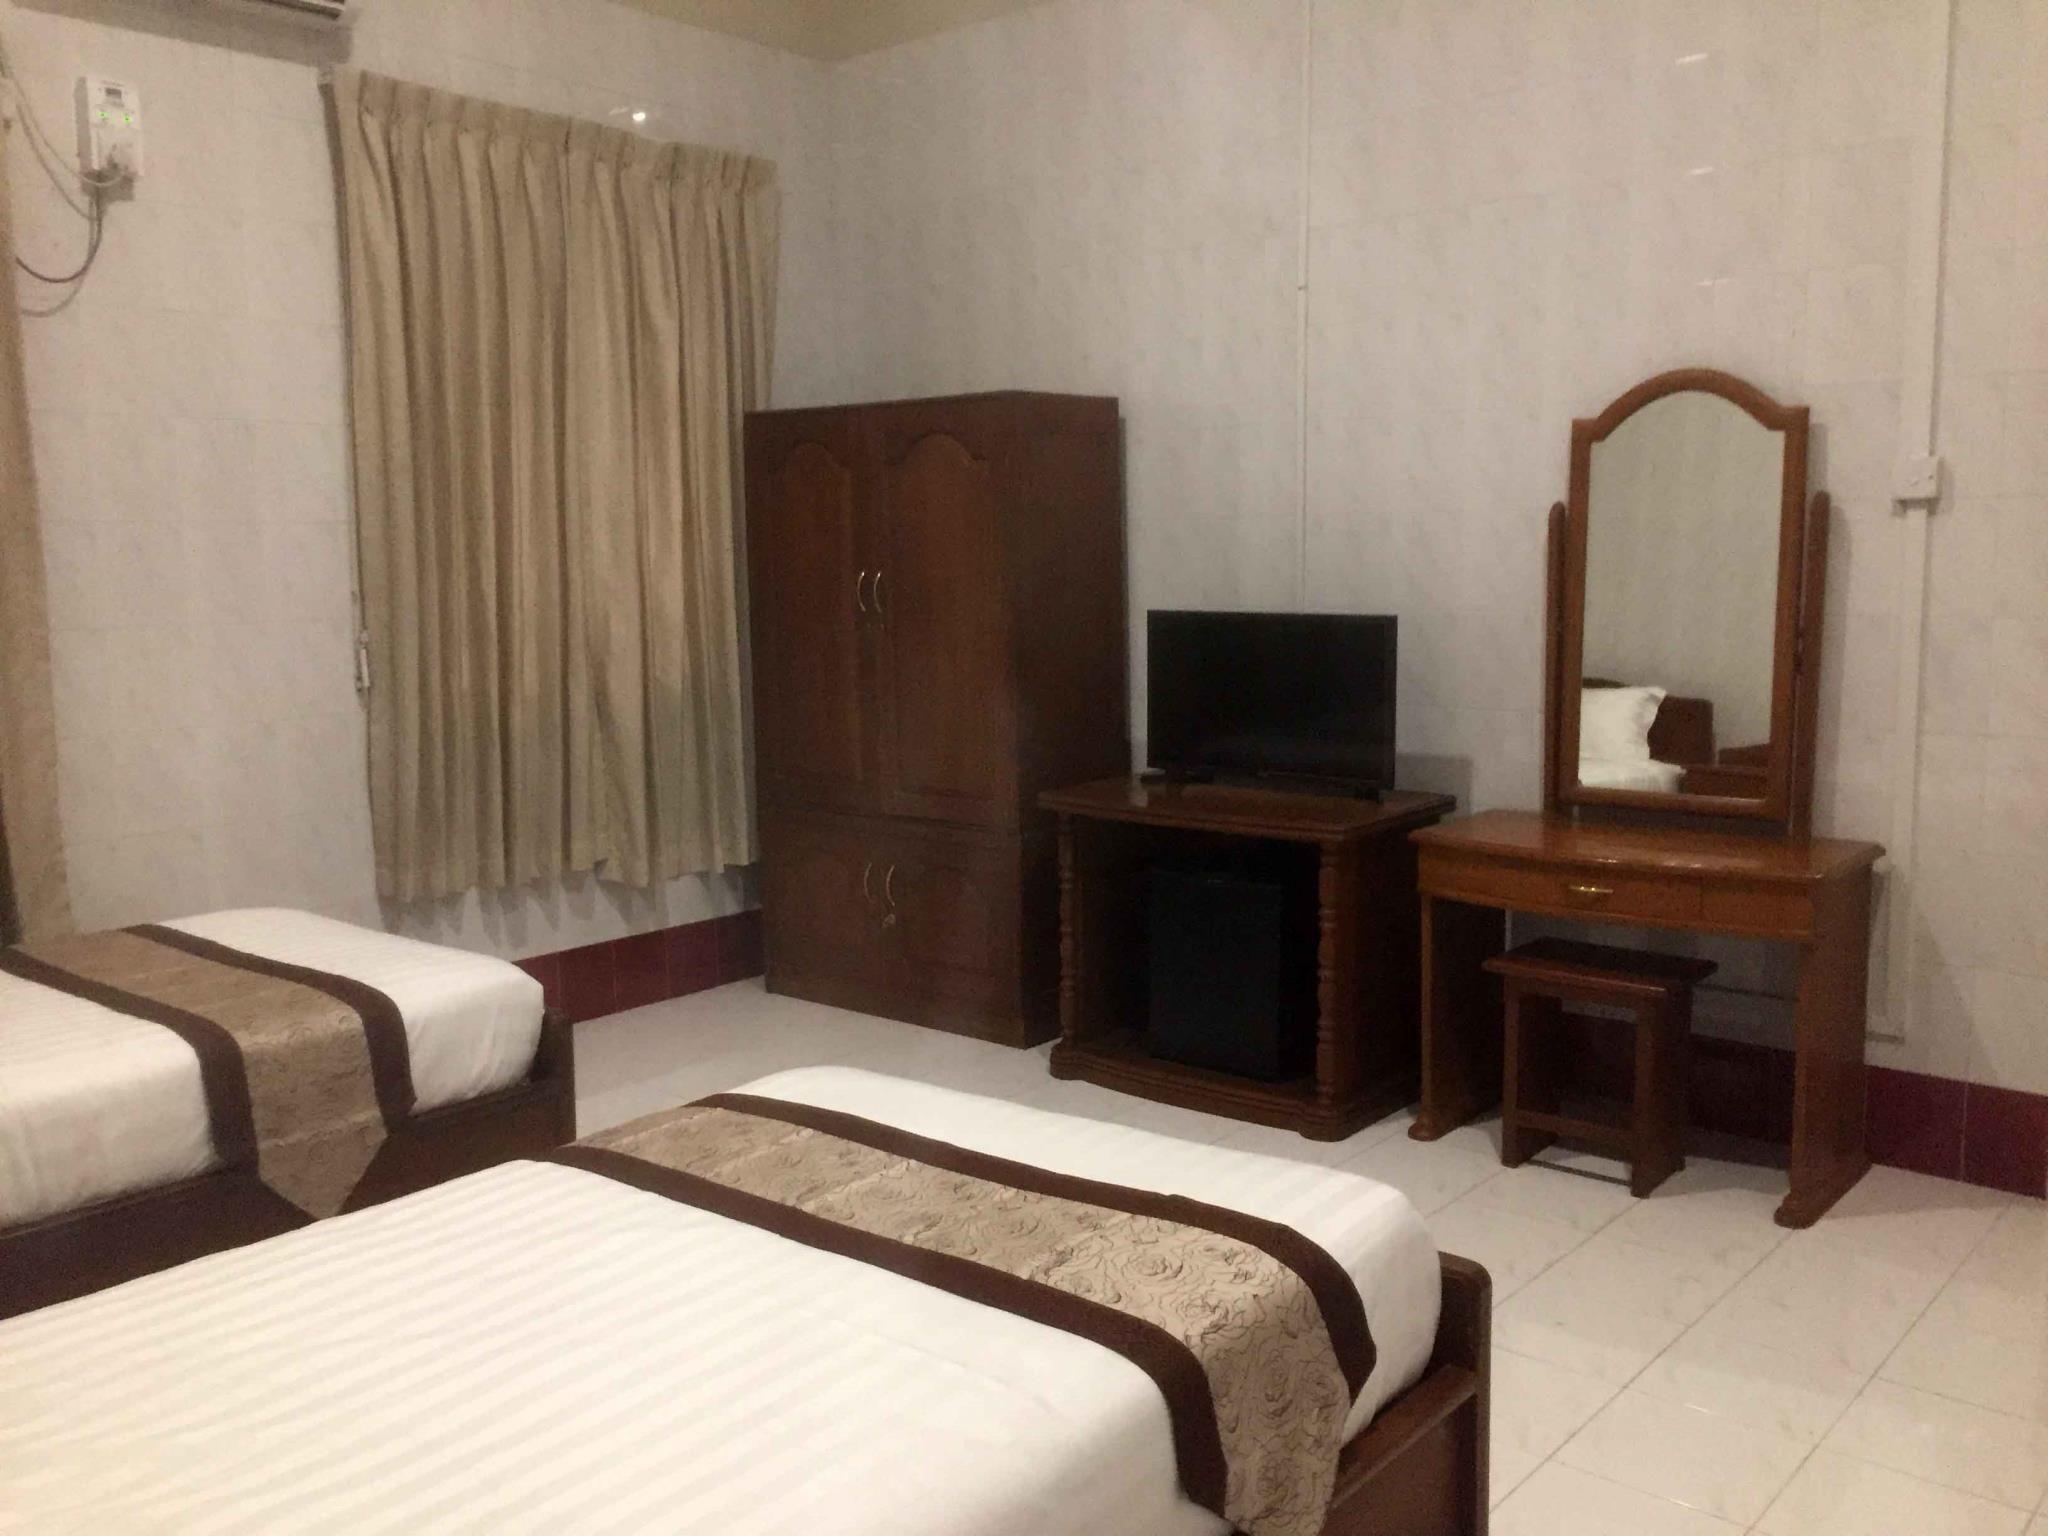 Ruby Garden Hotel Yangon, Myanmar | Home, Hotel, Home decor